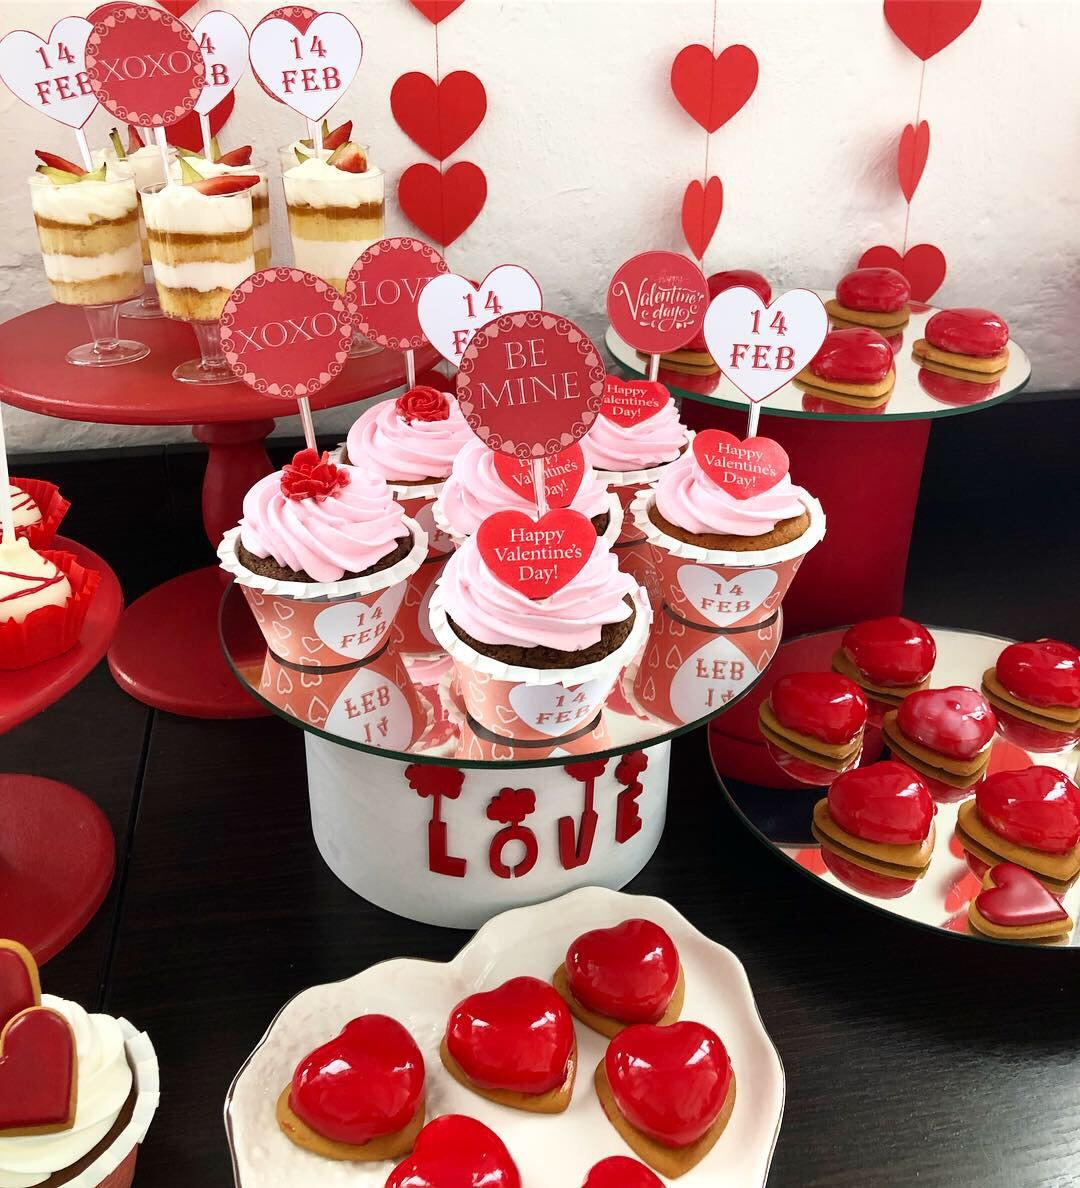 Кенди бар на День Влюбленных. Кенди бар на 14 февраля